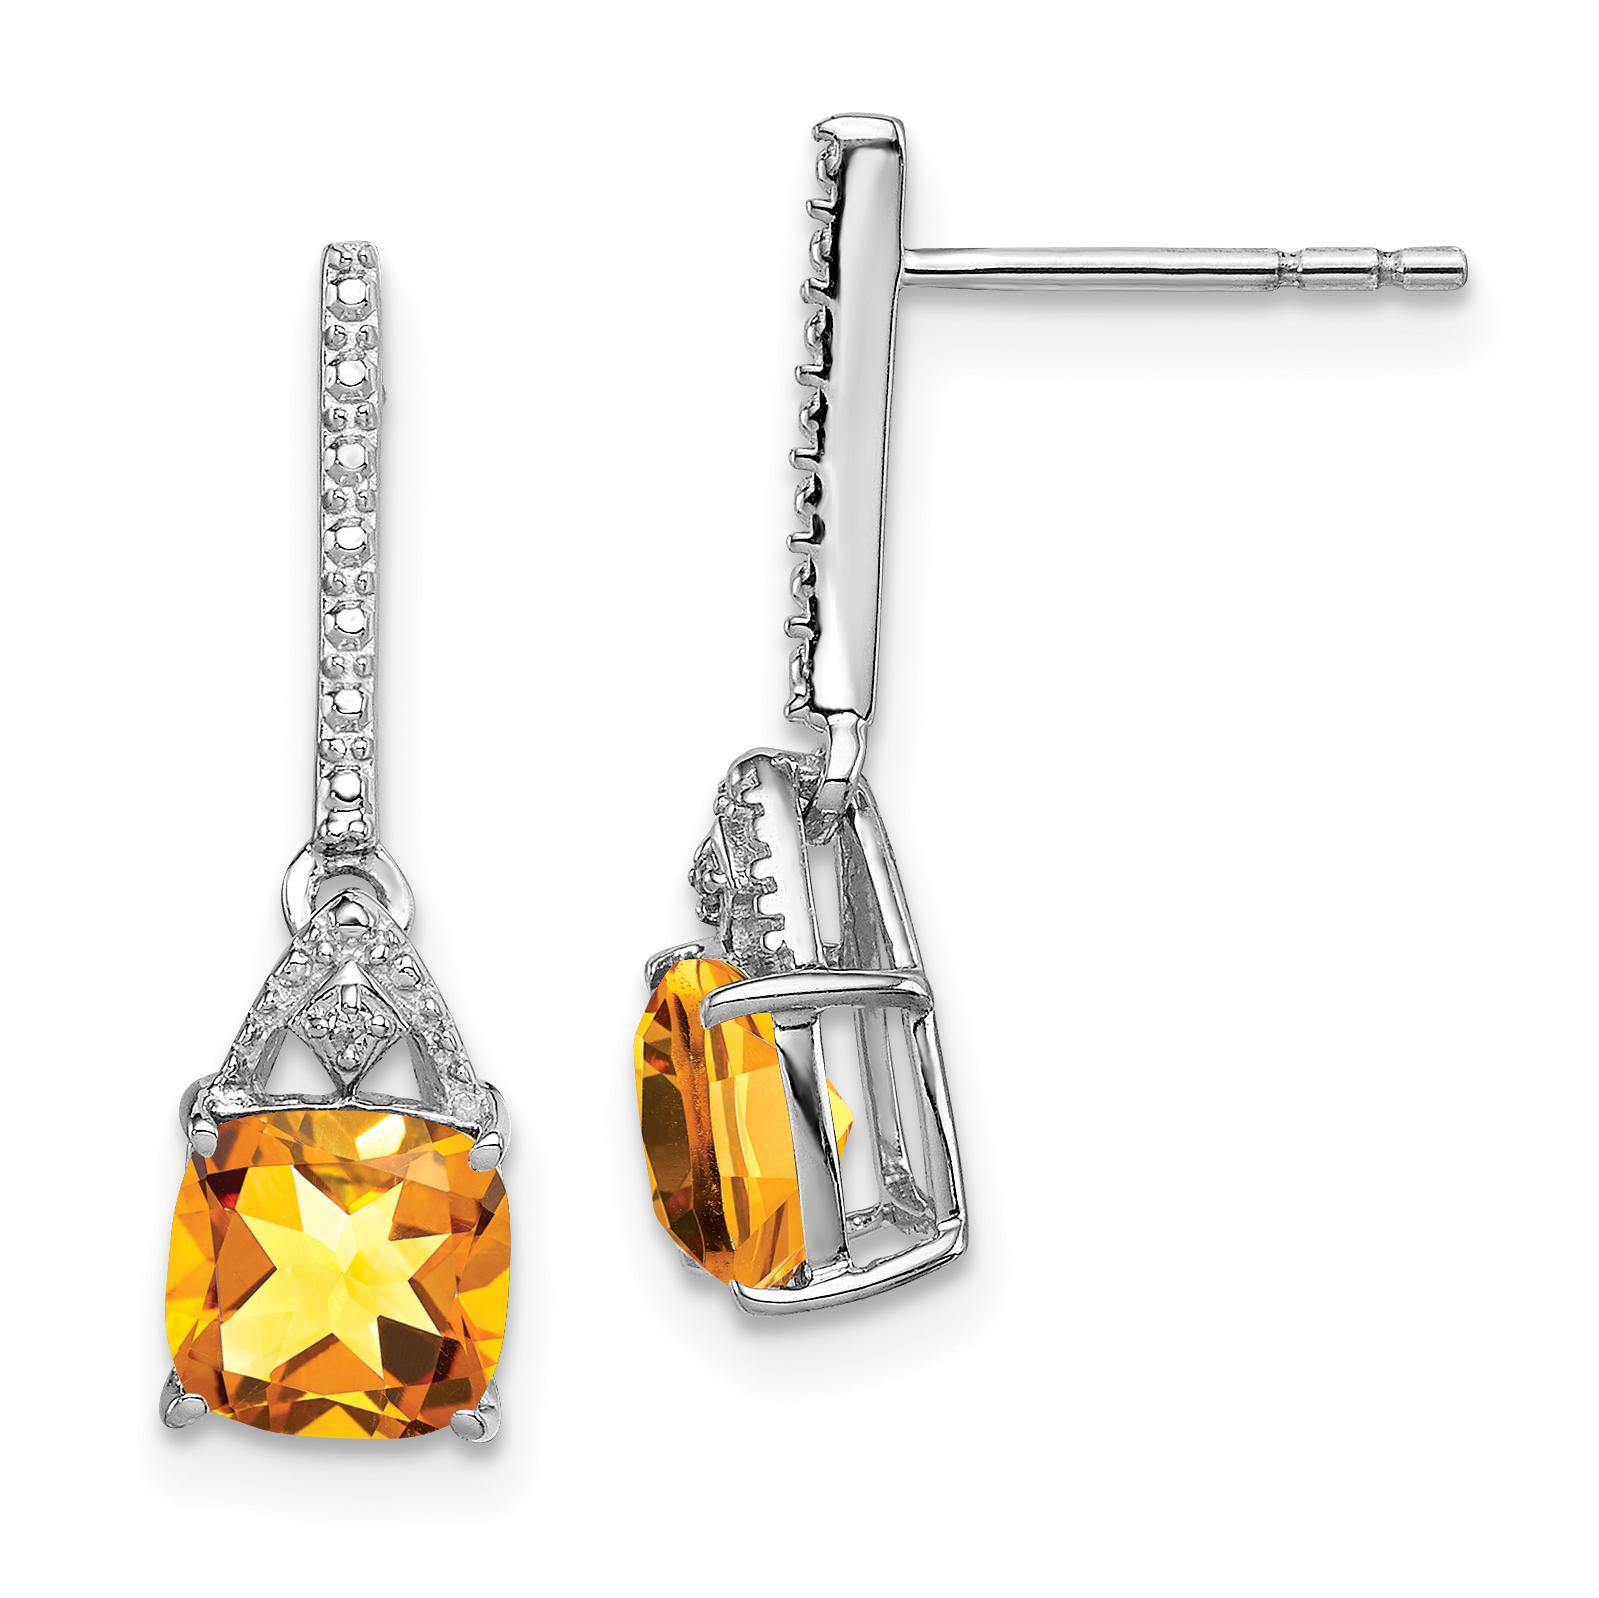 Lex /& Lu LogoArt Sterling Silver University of Southern California Small Dangle Earrings Wire